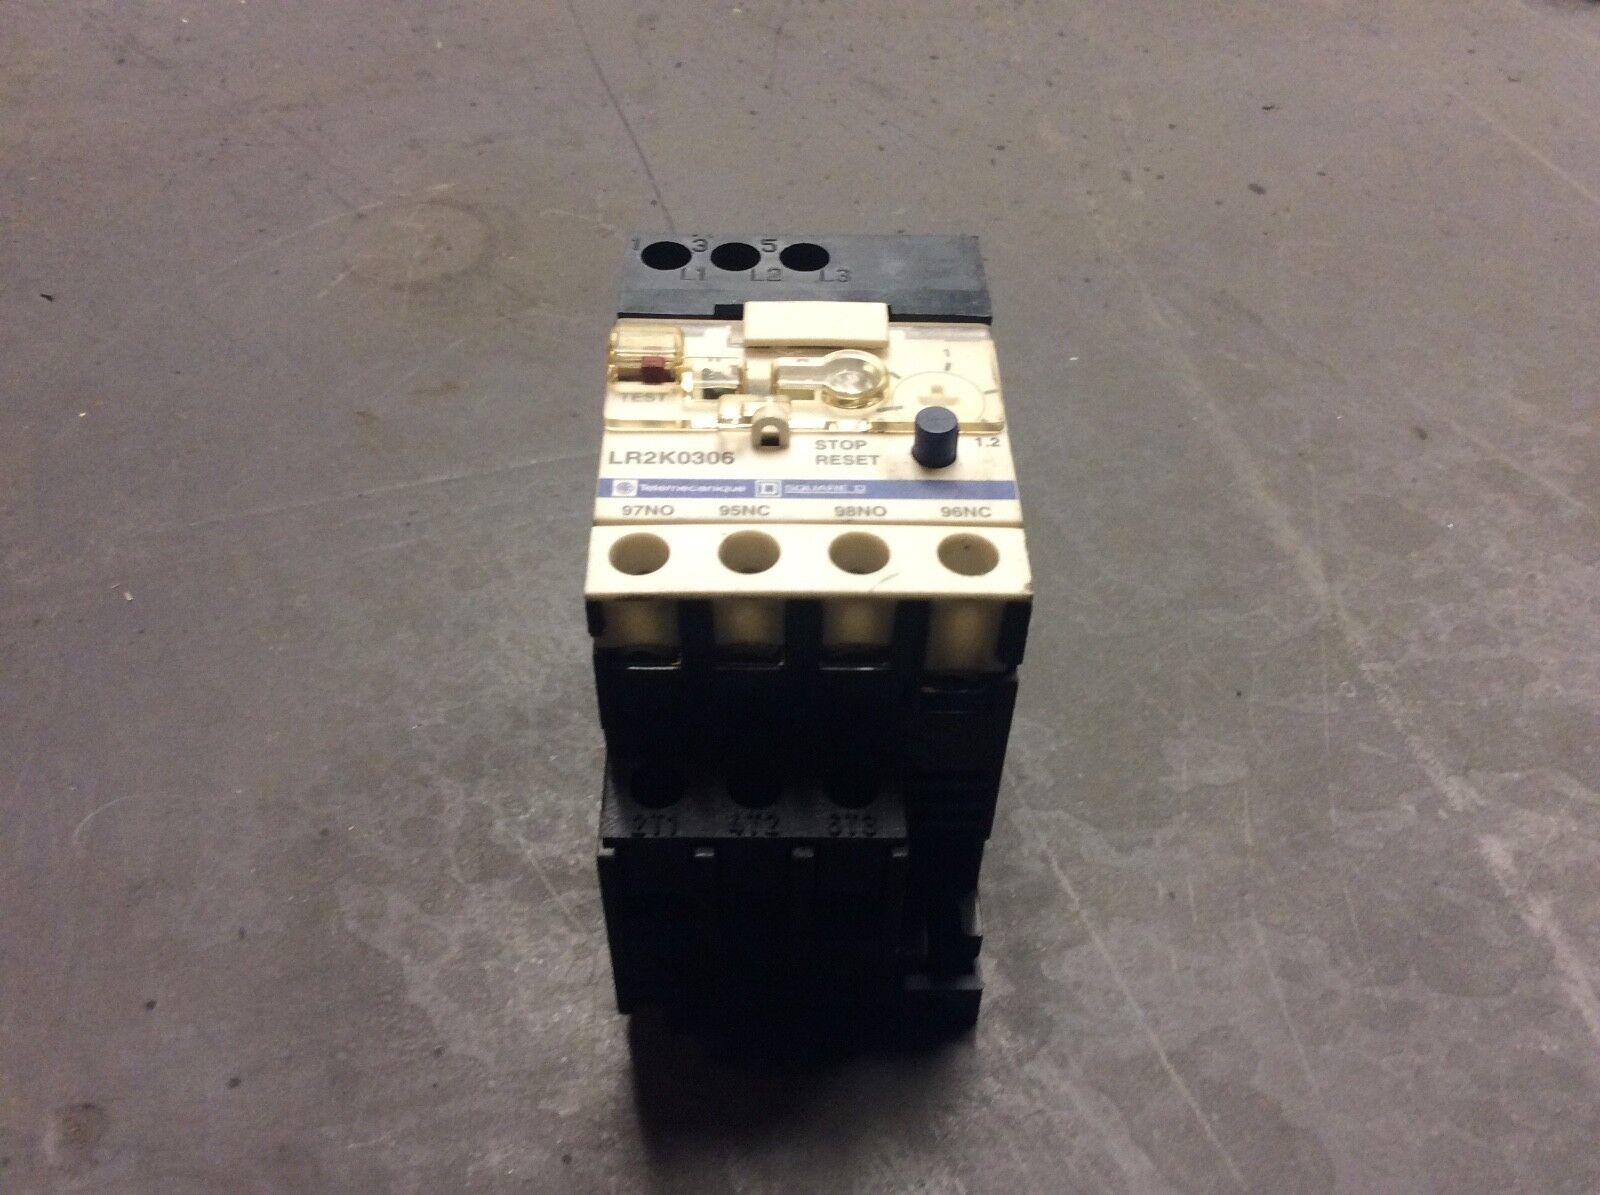 Telemecanique Overload Relay, # LR2K0306, 0.8 - 1.2 A Range, Used, Warranty